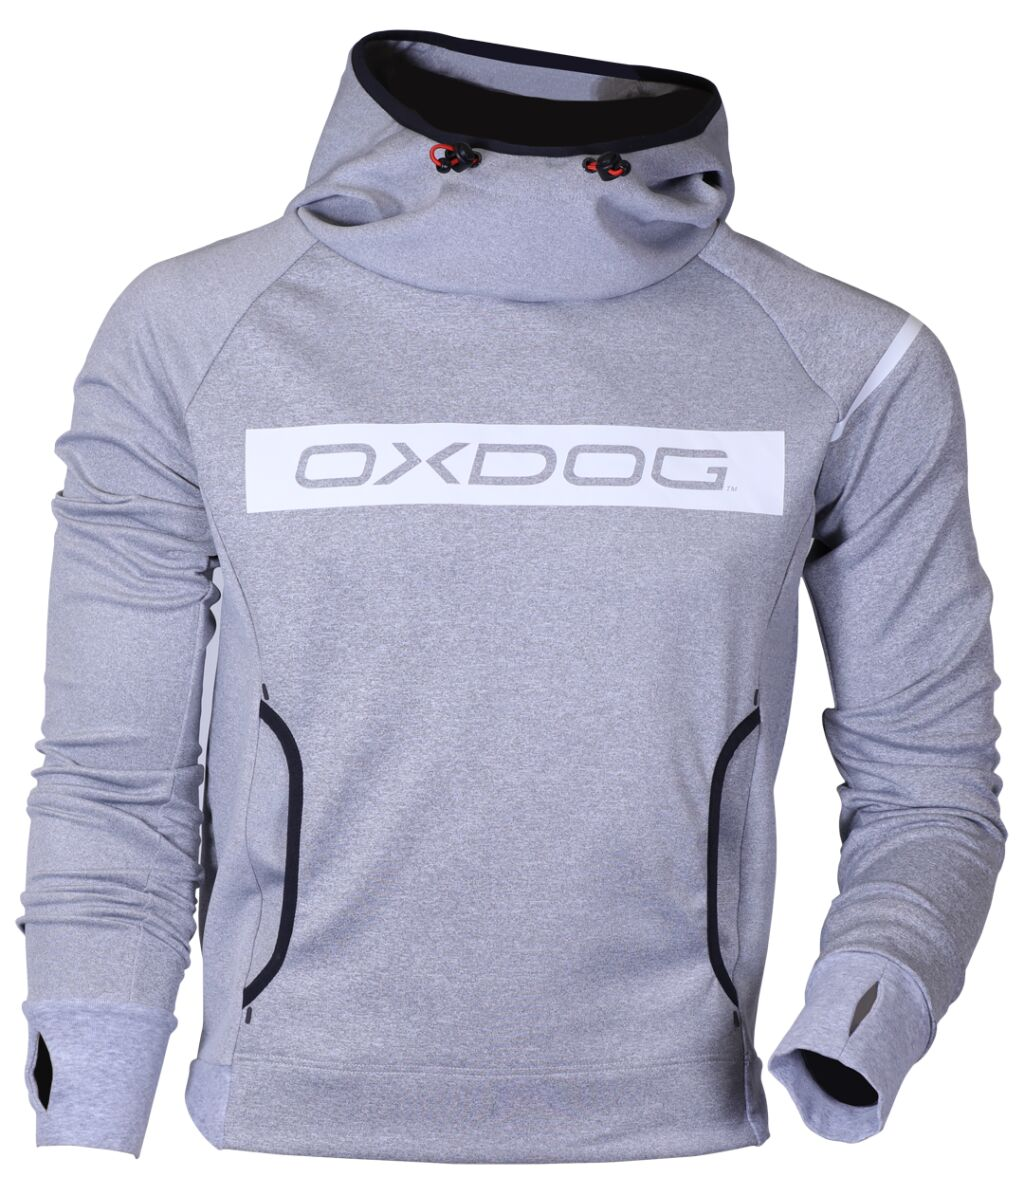 Oxdog ATX hood